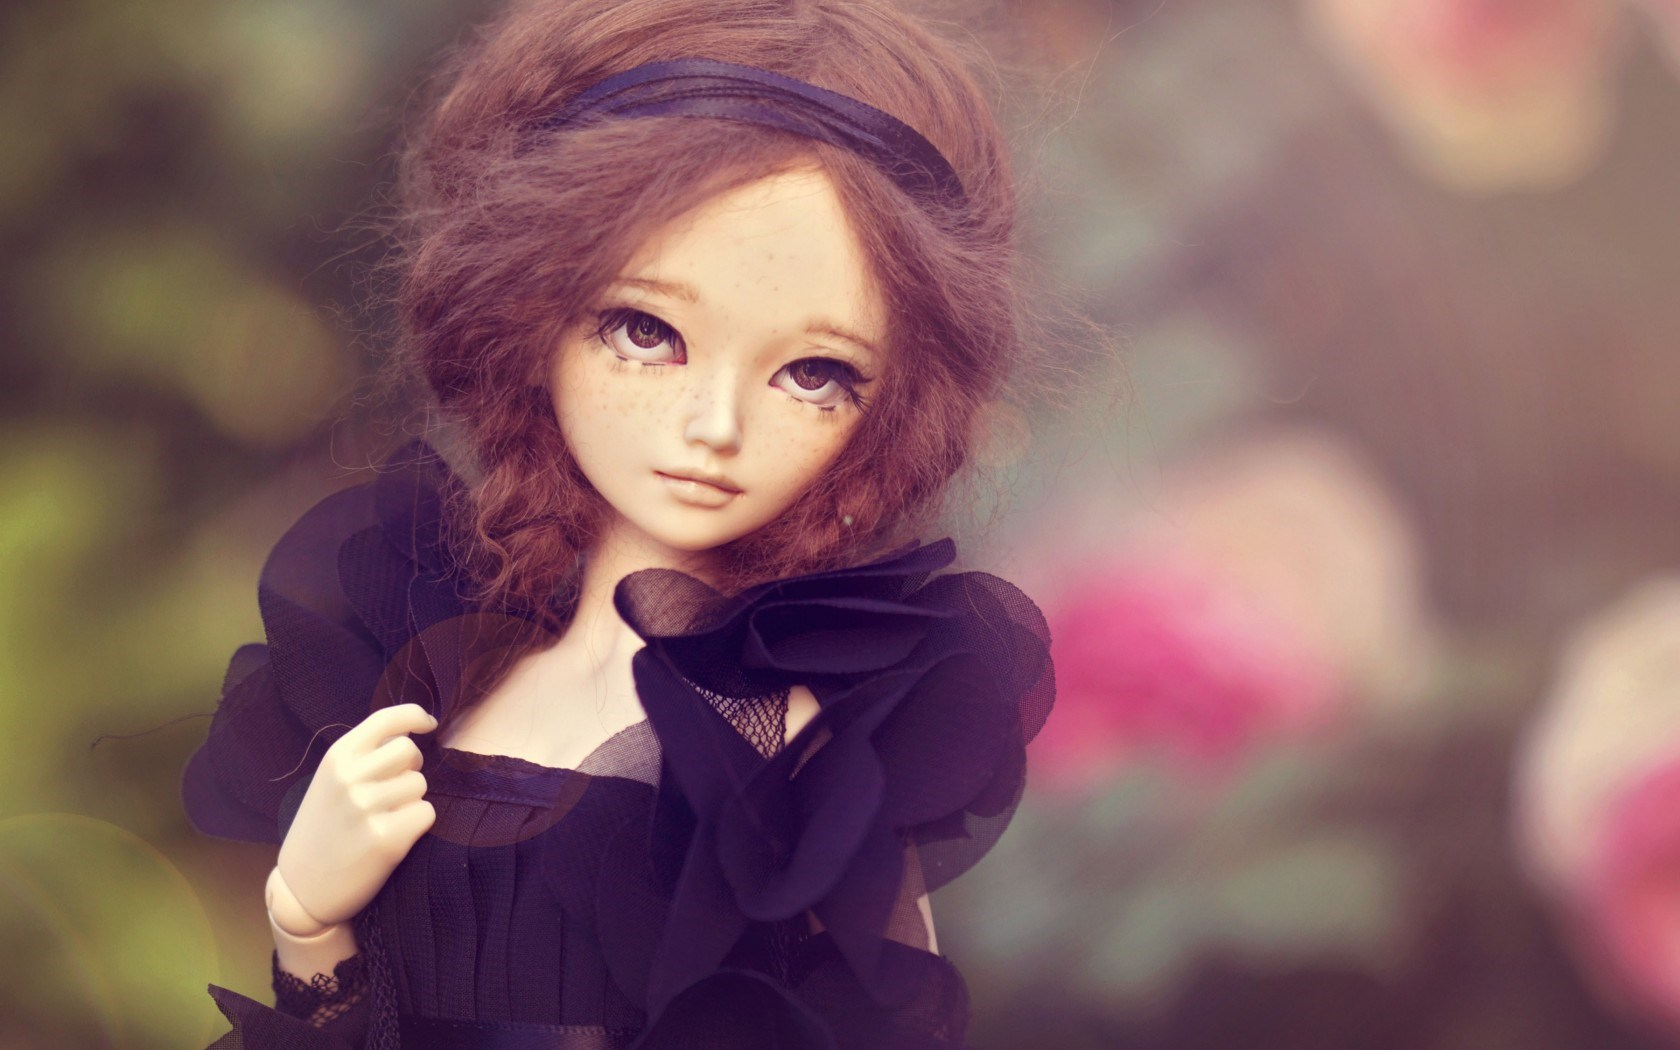 Beautiful Doll   Wallpaper High Definition High Quality Widescreen 1680x1050